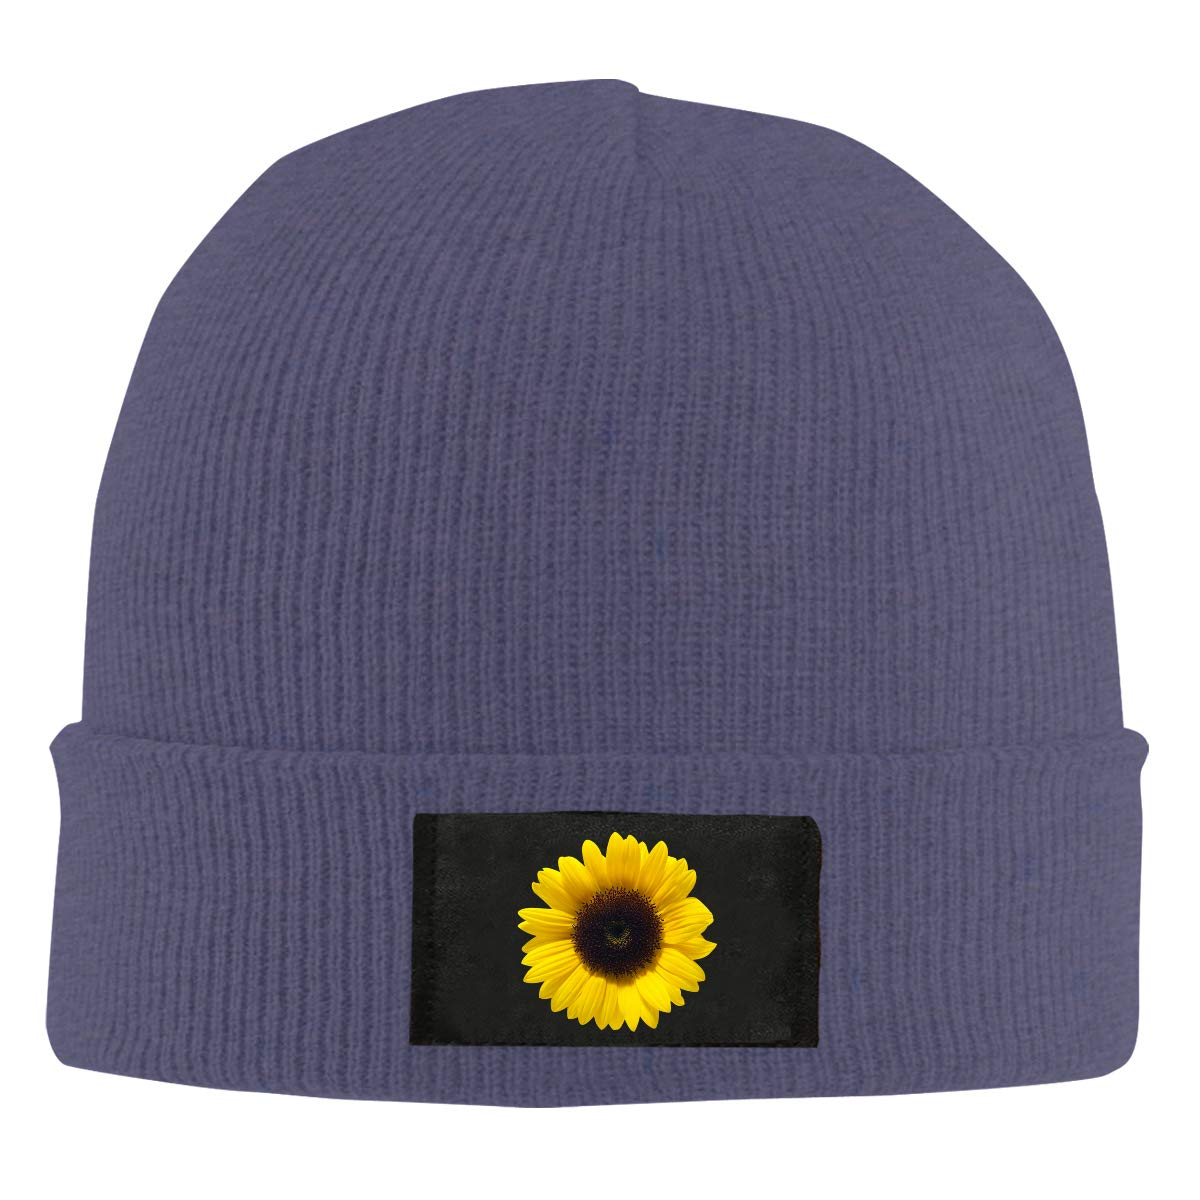 Men Women Sunflower Soleil Skull Hat Beanie Cap Winter Knit Hat Cap